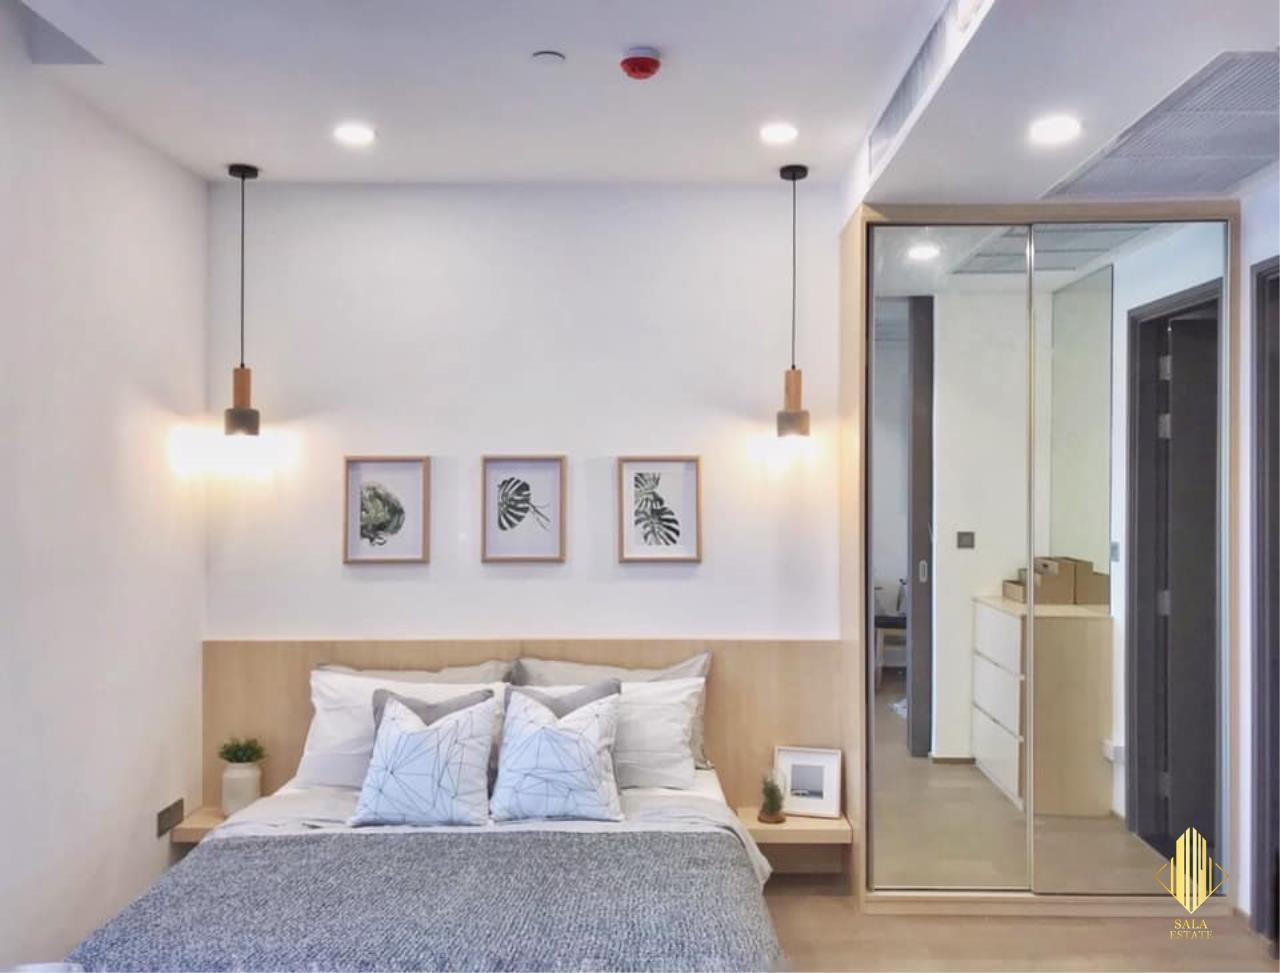 SALA ESTATE Agency's ( FOR RENT ) ASHTON CHULA SILOM – MRT SAMYAN, 31 SQM 1 BEDROOM 1 BEDROOM, FULLY FURNISHED, HIGH FLOOR 5